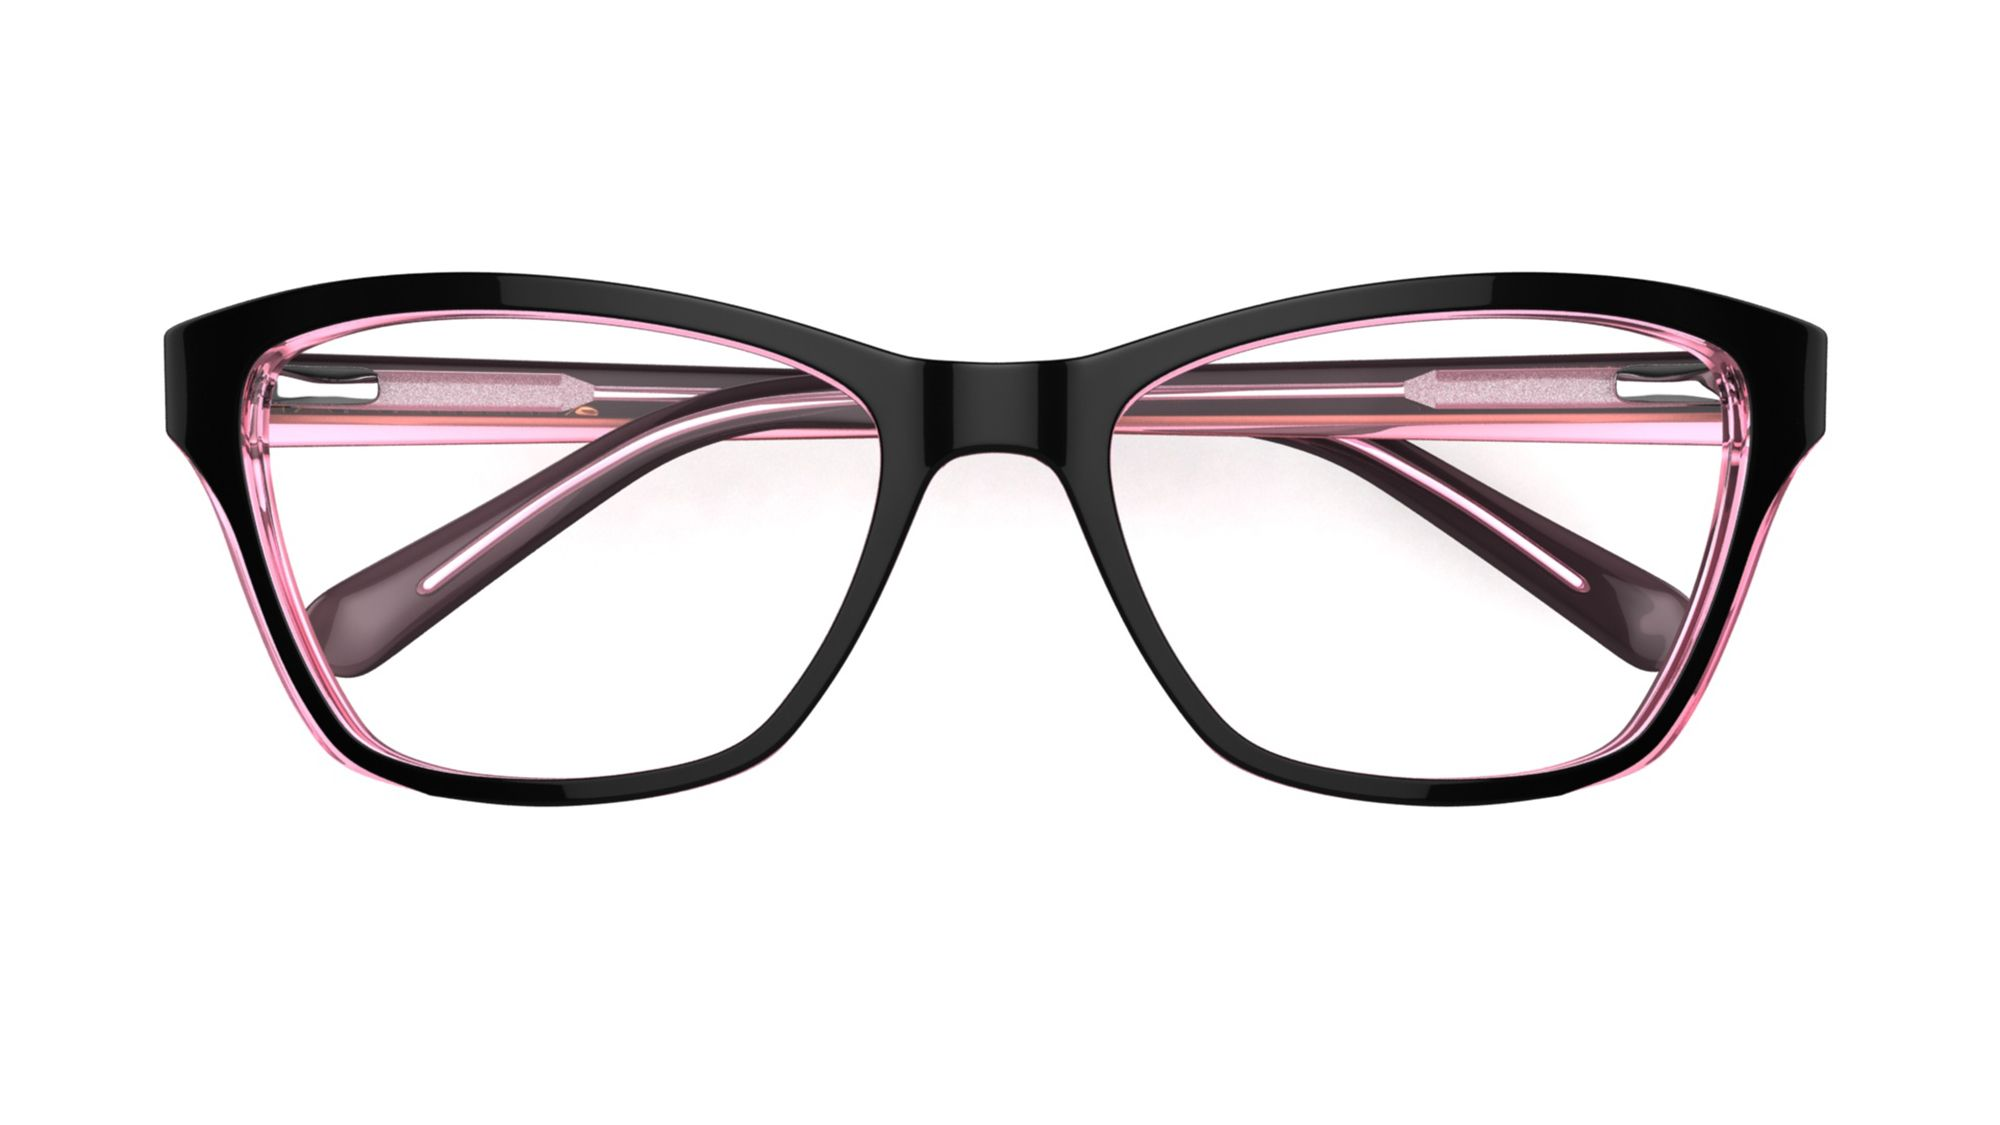 7bb0fa8b42 Love Moschino glasses - LM 03